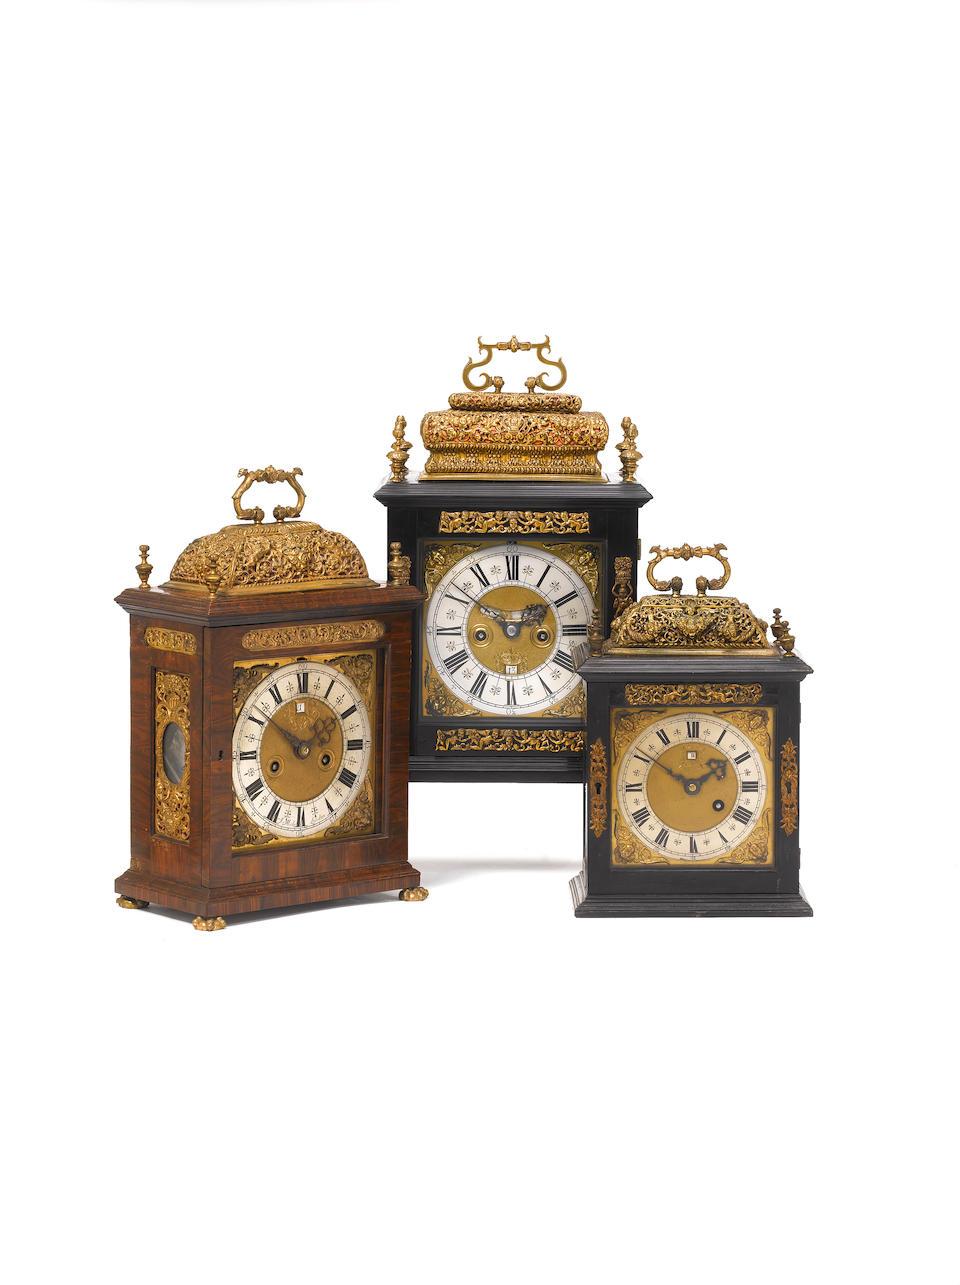 A very rare late 17th century kingwood veneered quarter repeating basket-topped bracket clock James Michel, London